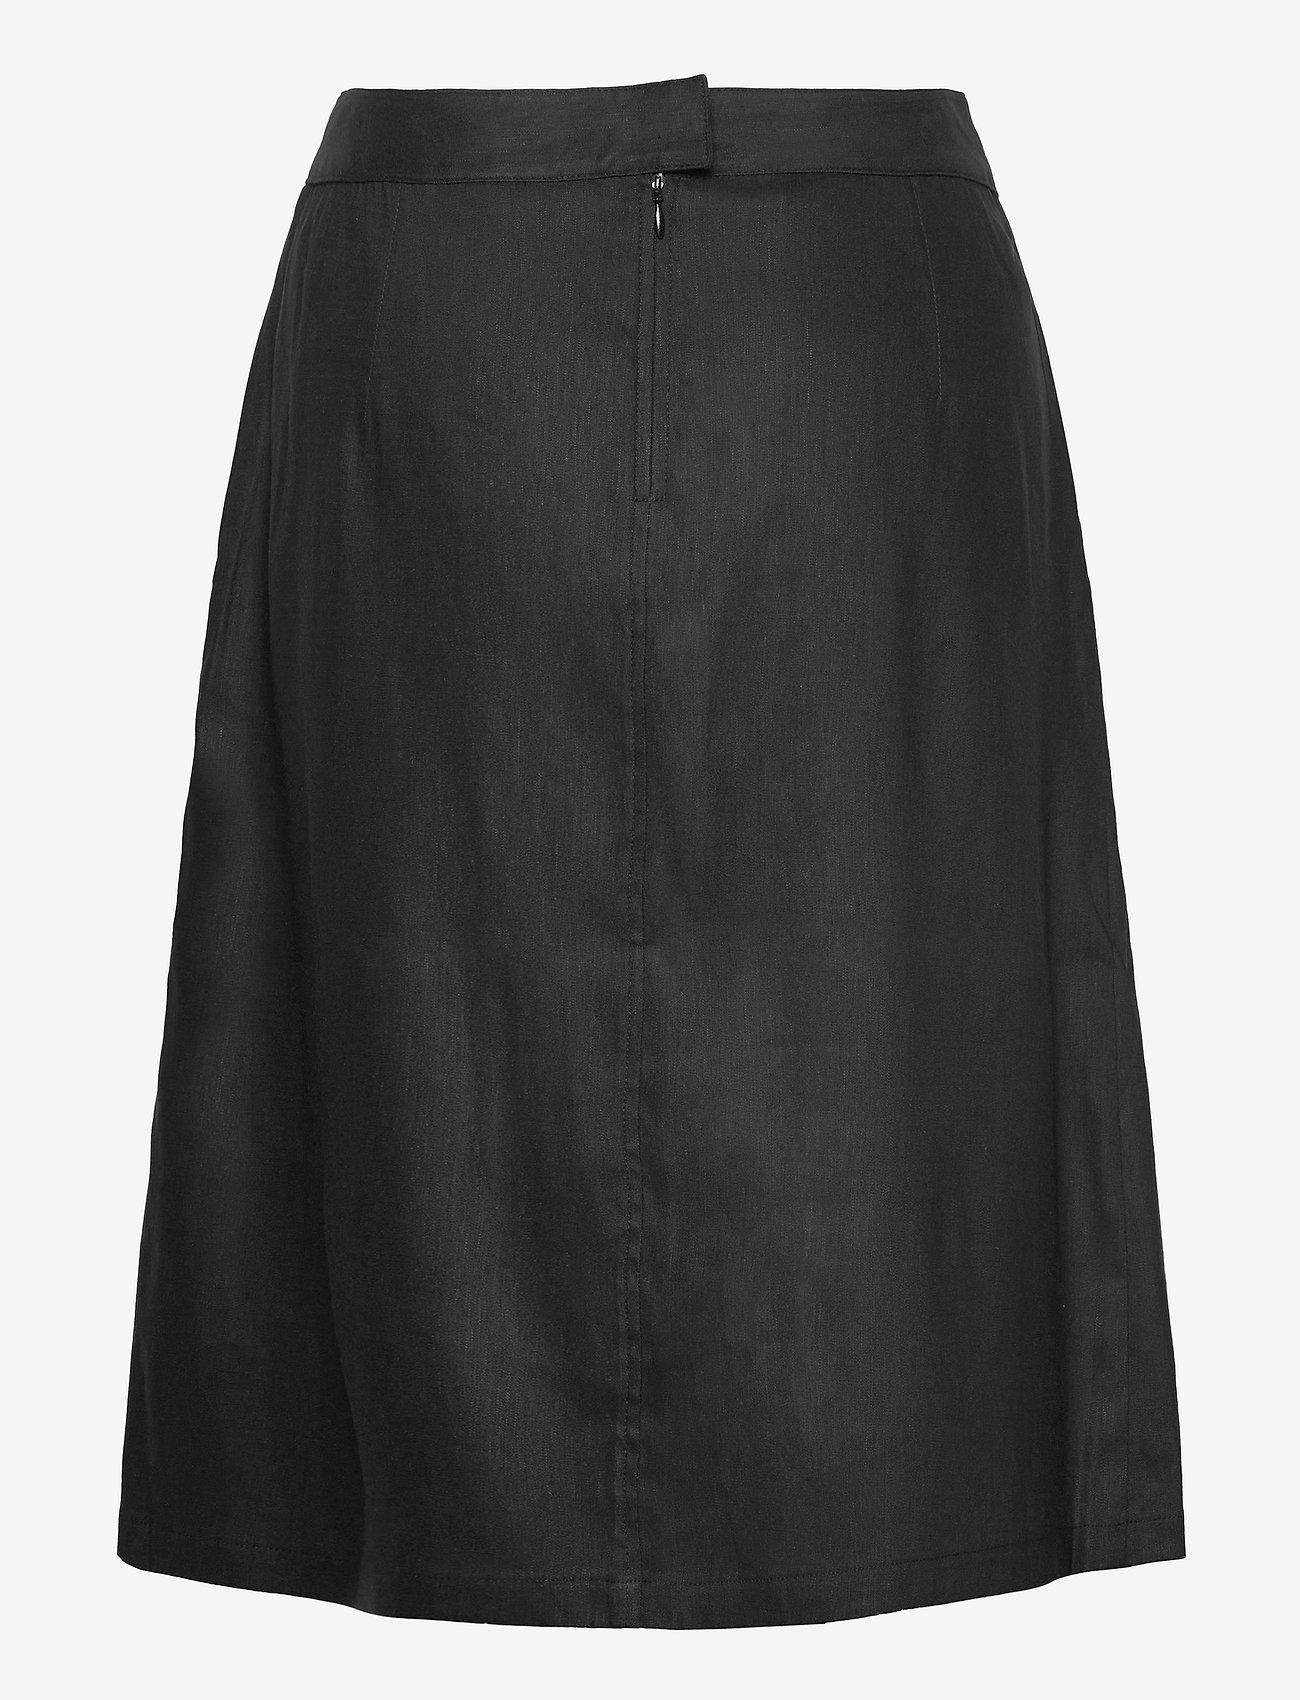 Masai - Soleils - spódnice do kolan i midi - black - 1